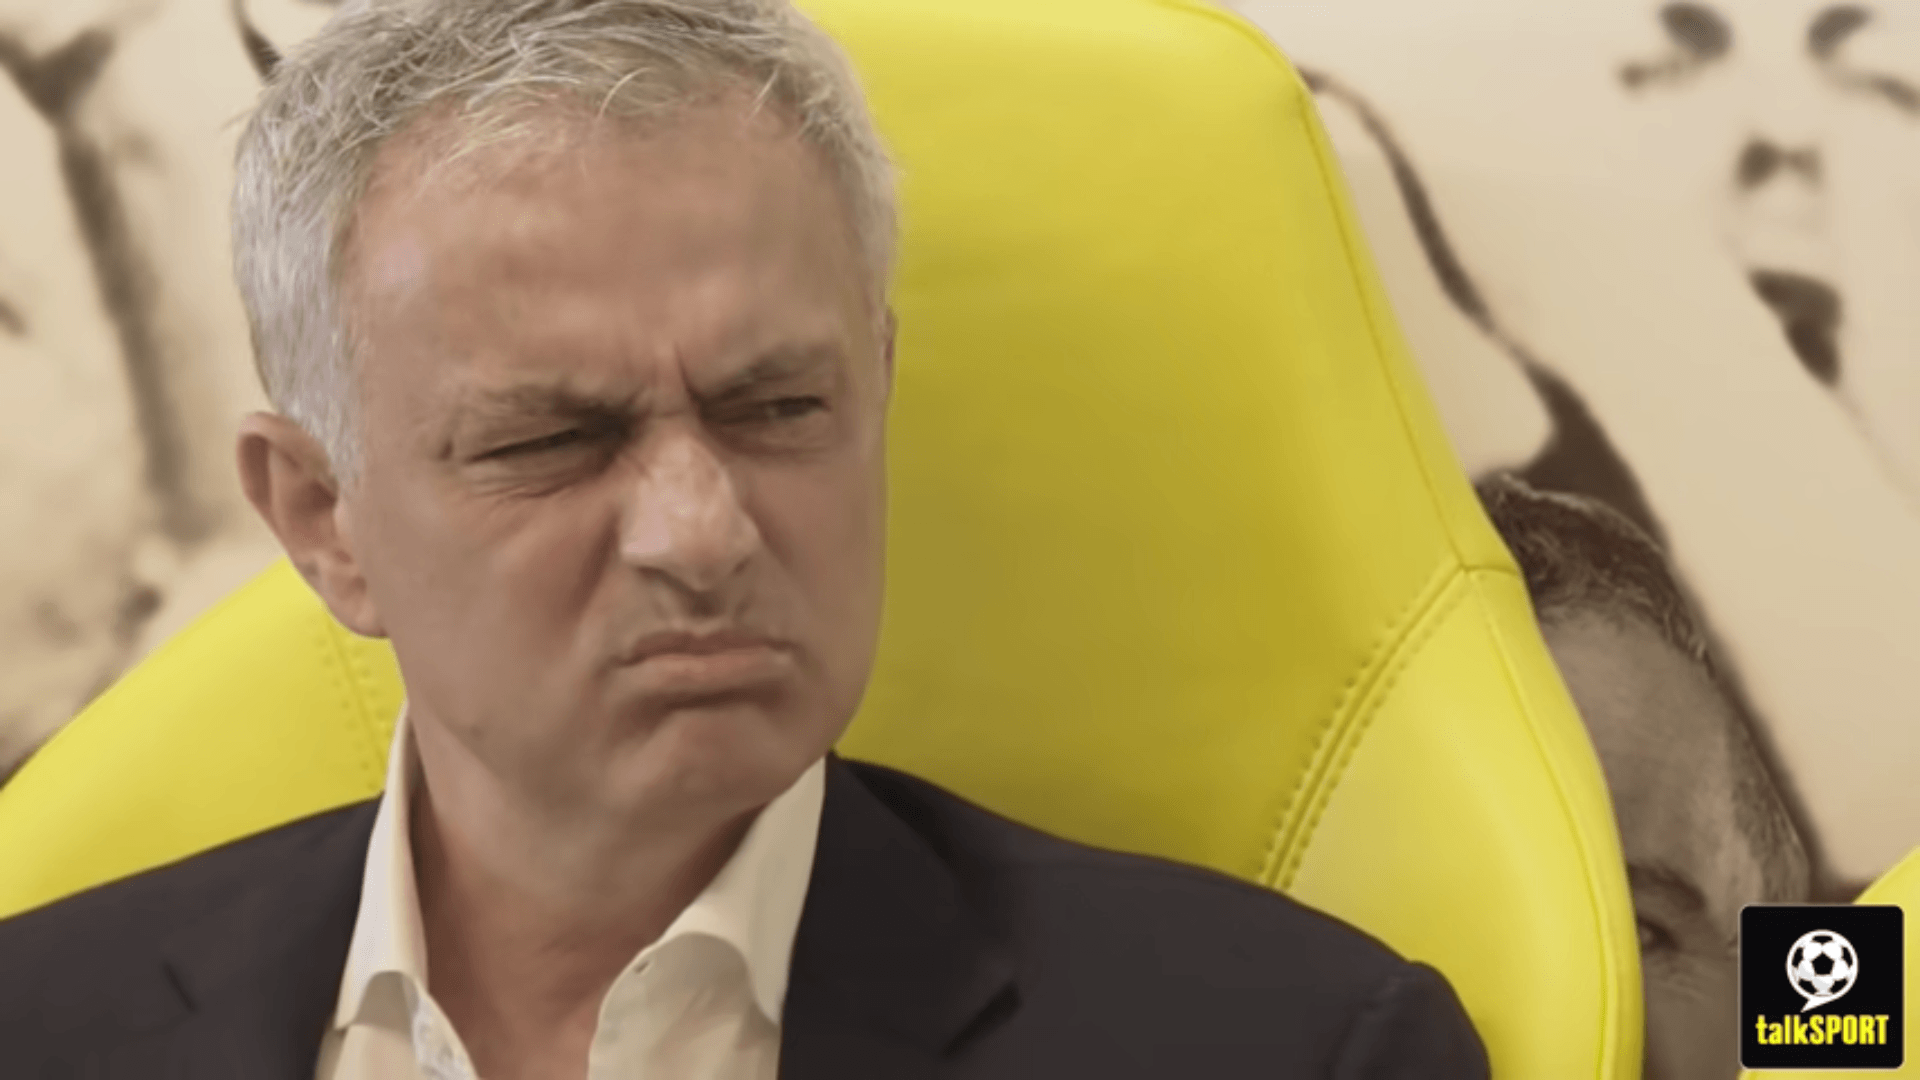 jose mourinho talksport and the sun